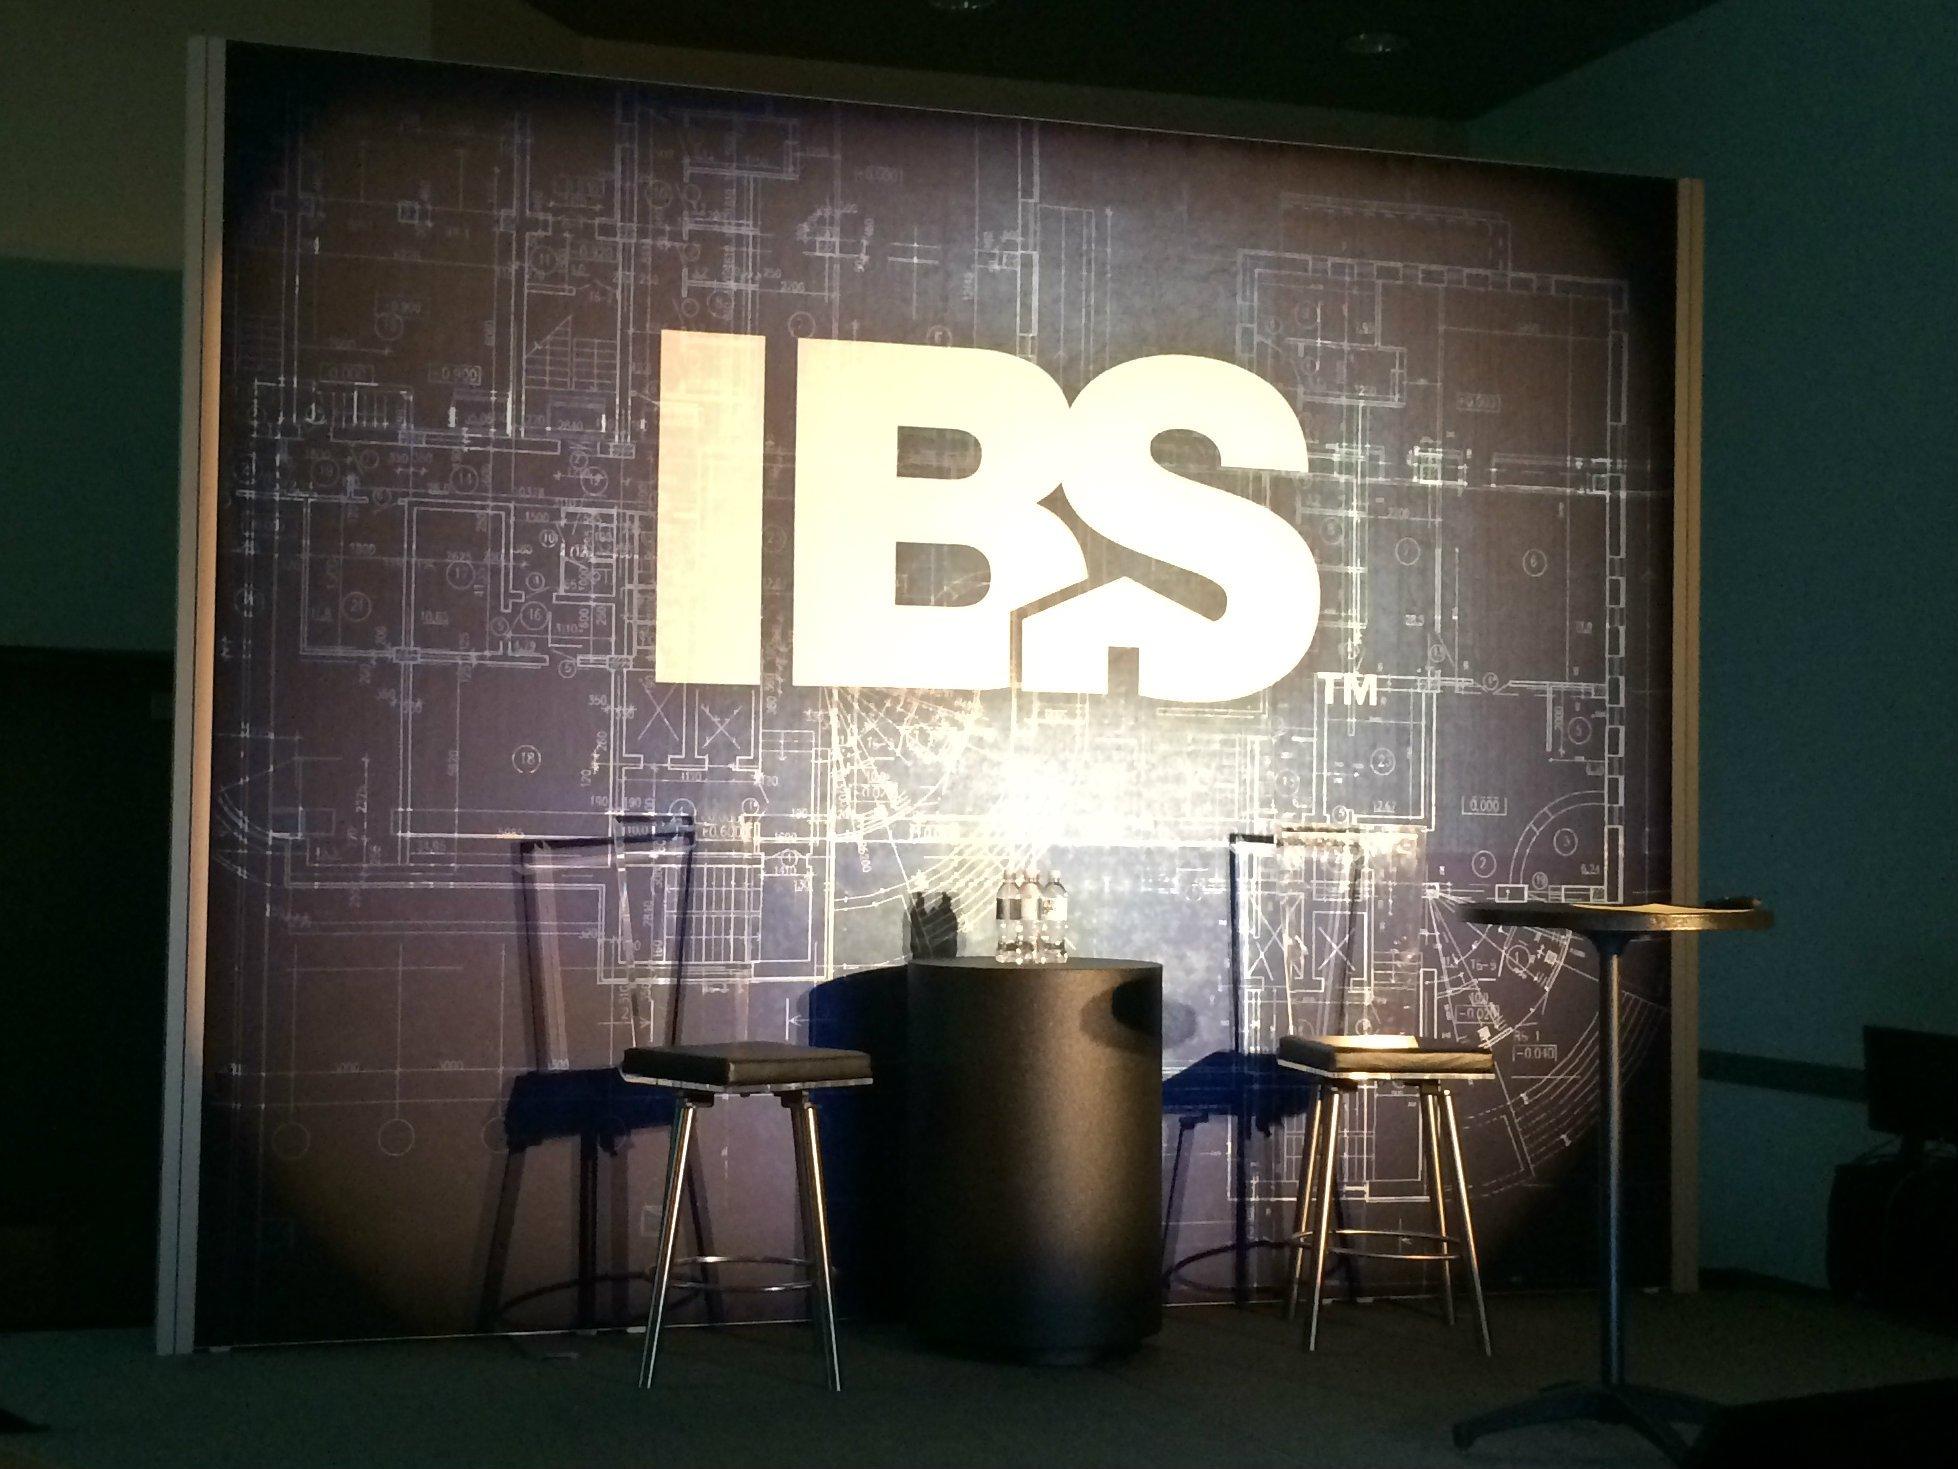 NAHB International Builders Show